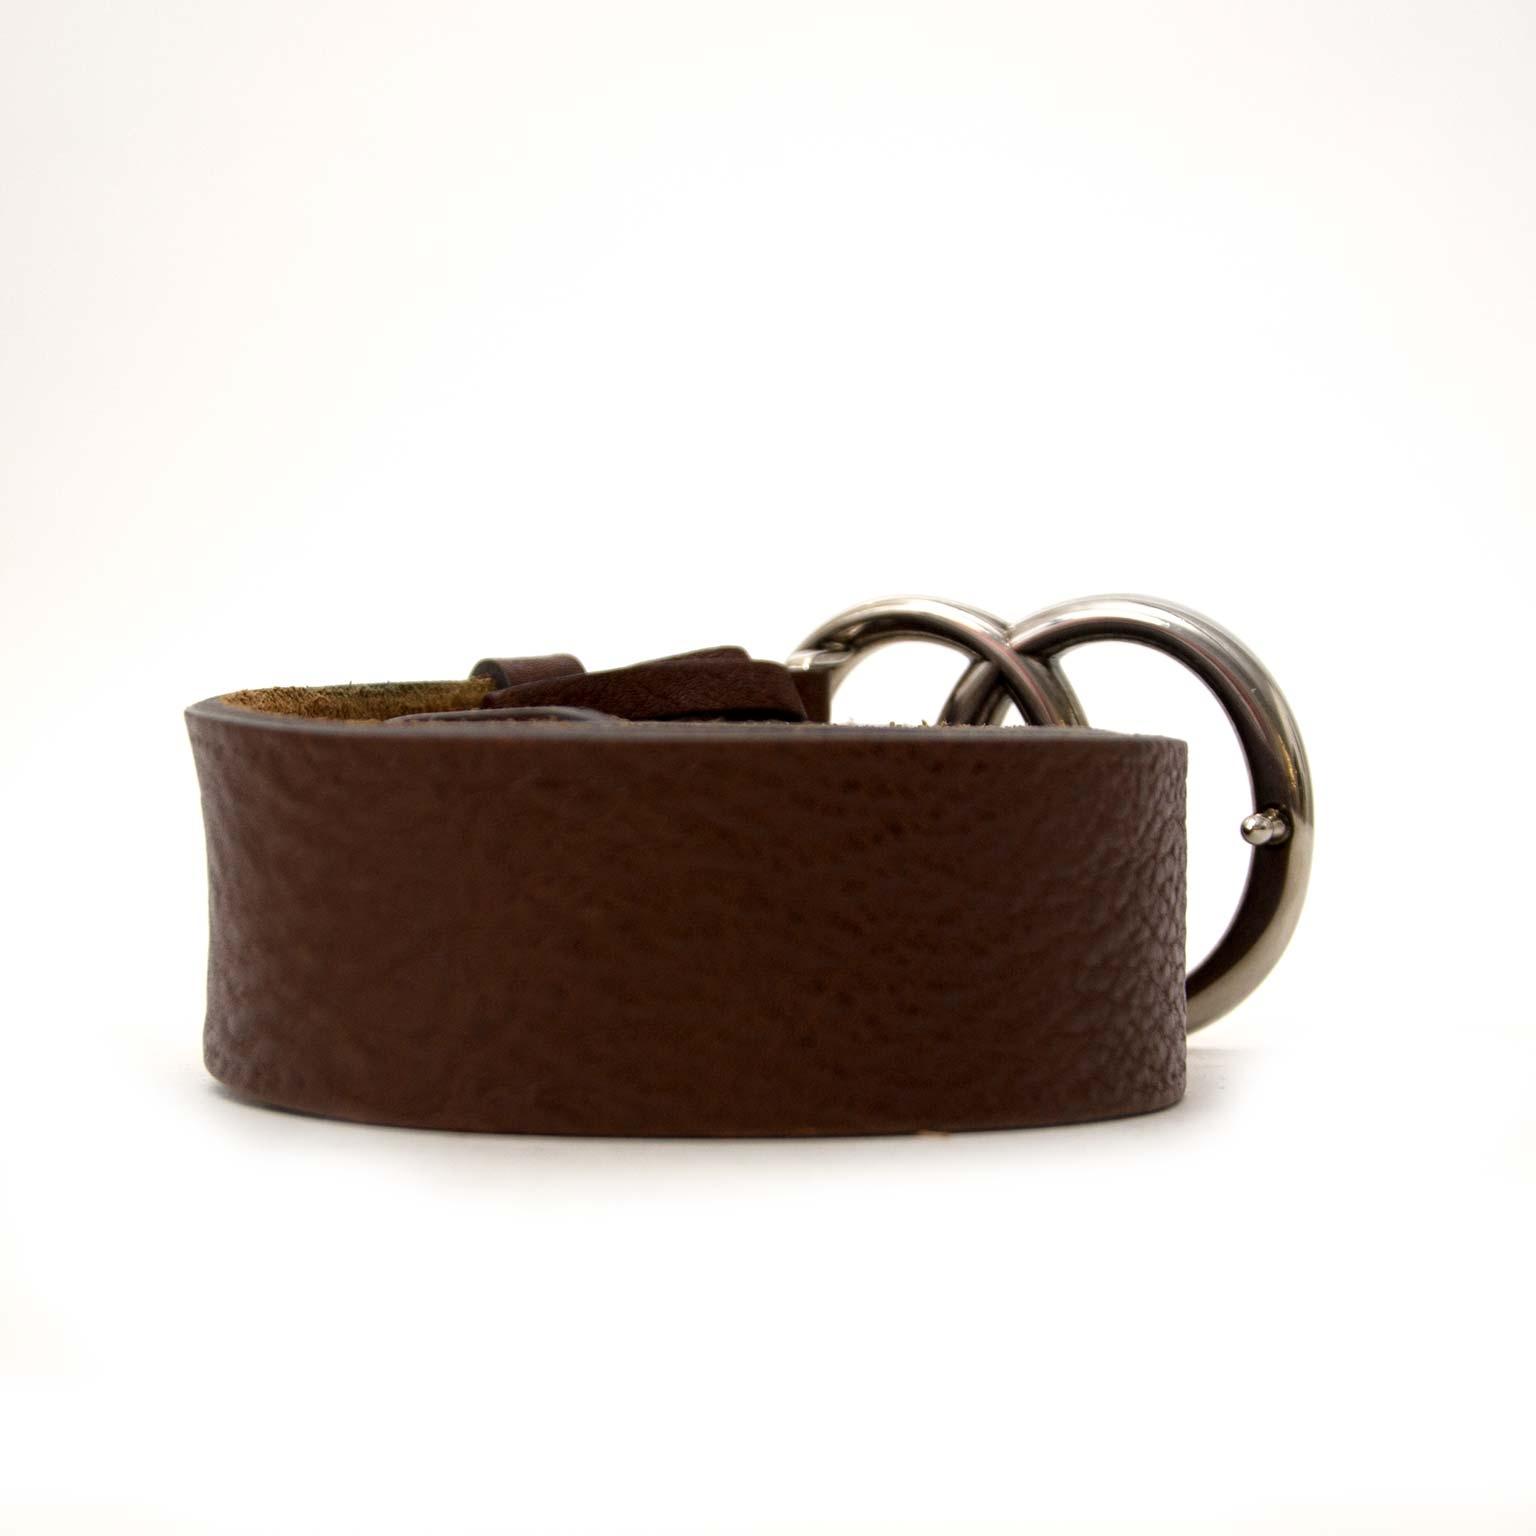 6ca84c20037 Buy authentic gucci double g brown leather belt online at labellov vintage  fashion webshop belgium koop authentieke gucci double g bruine leder riem  bij ...